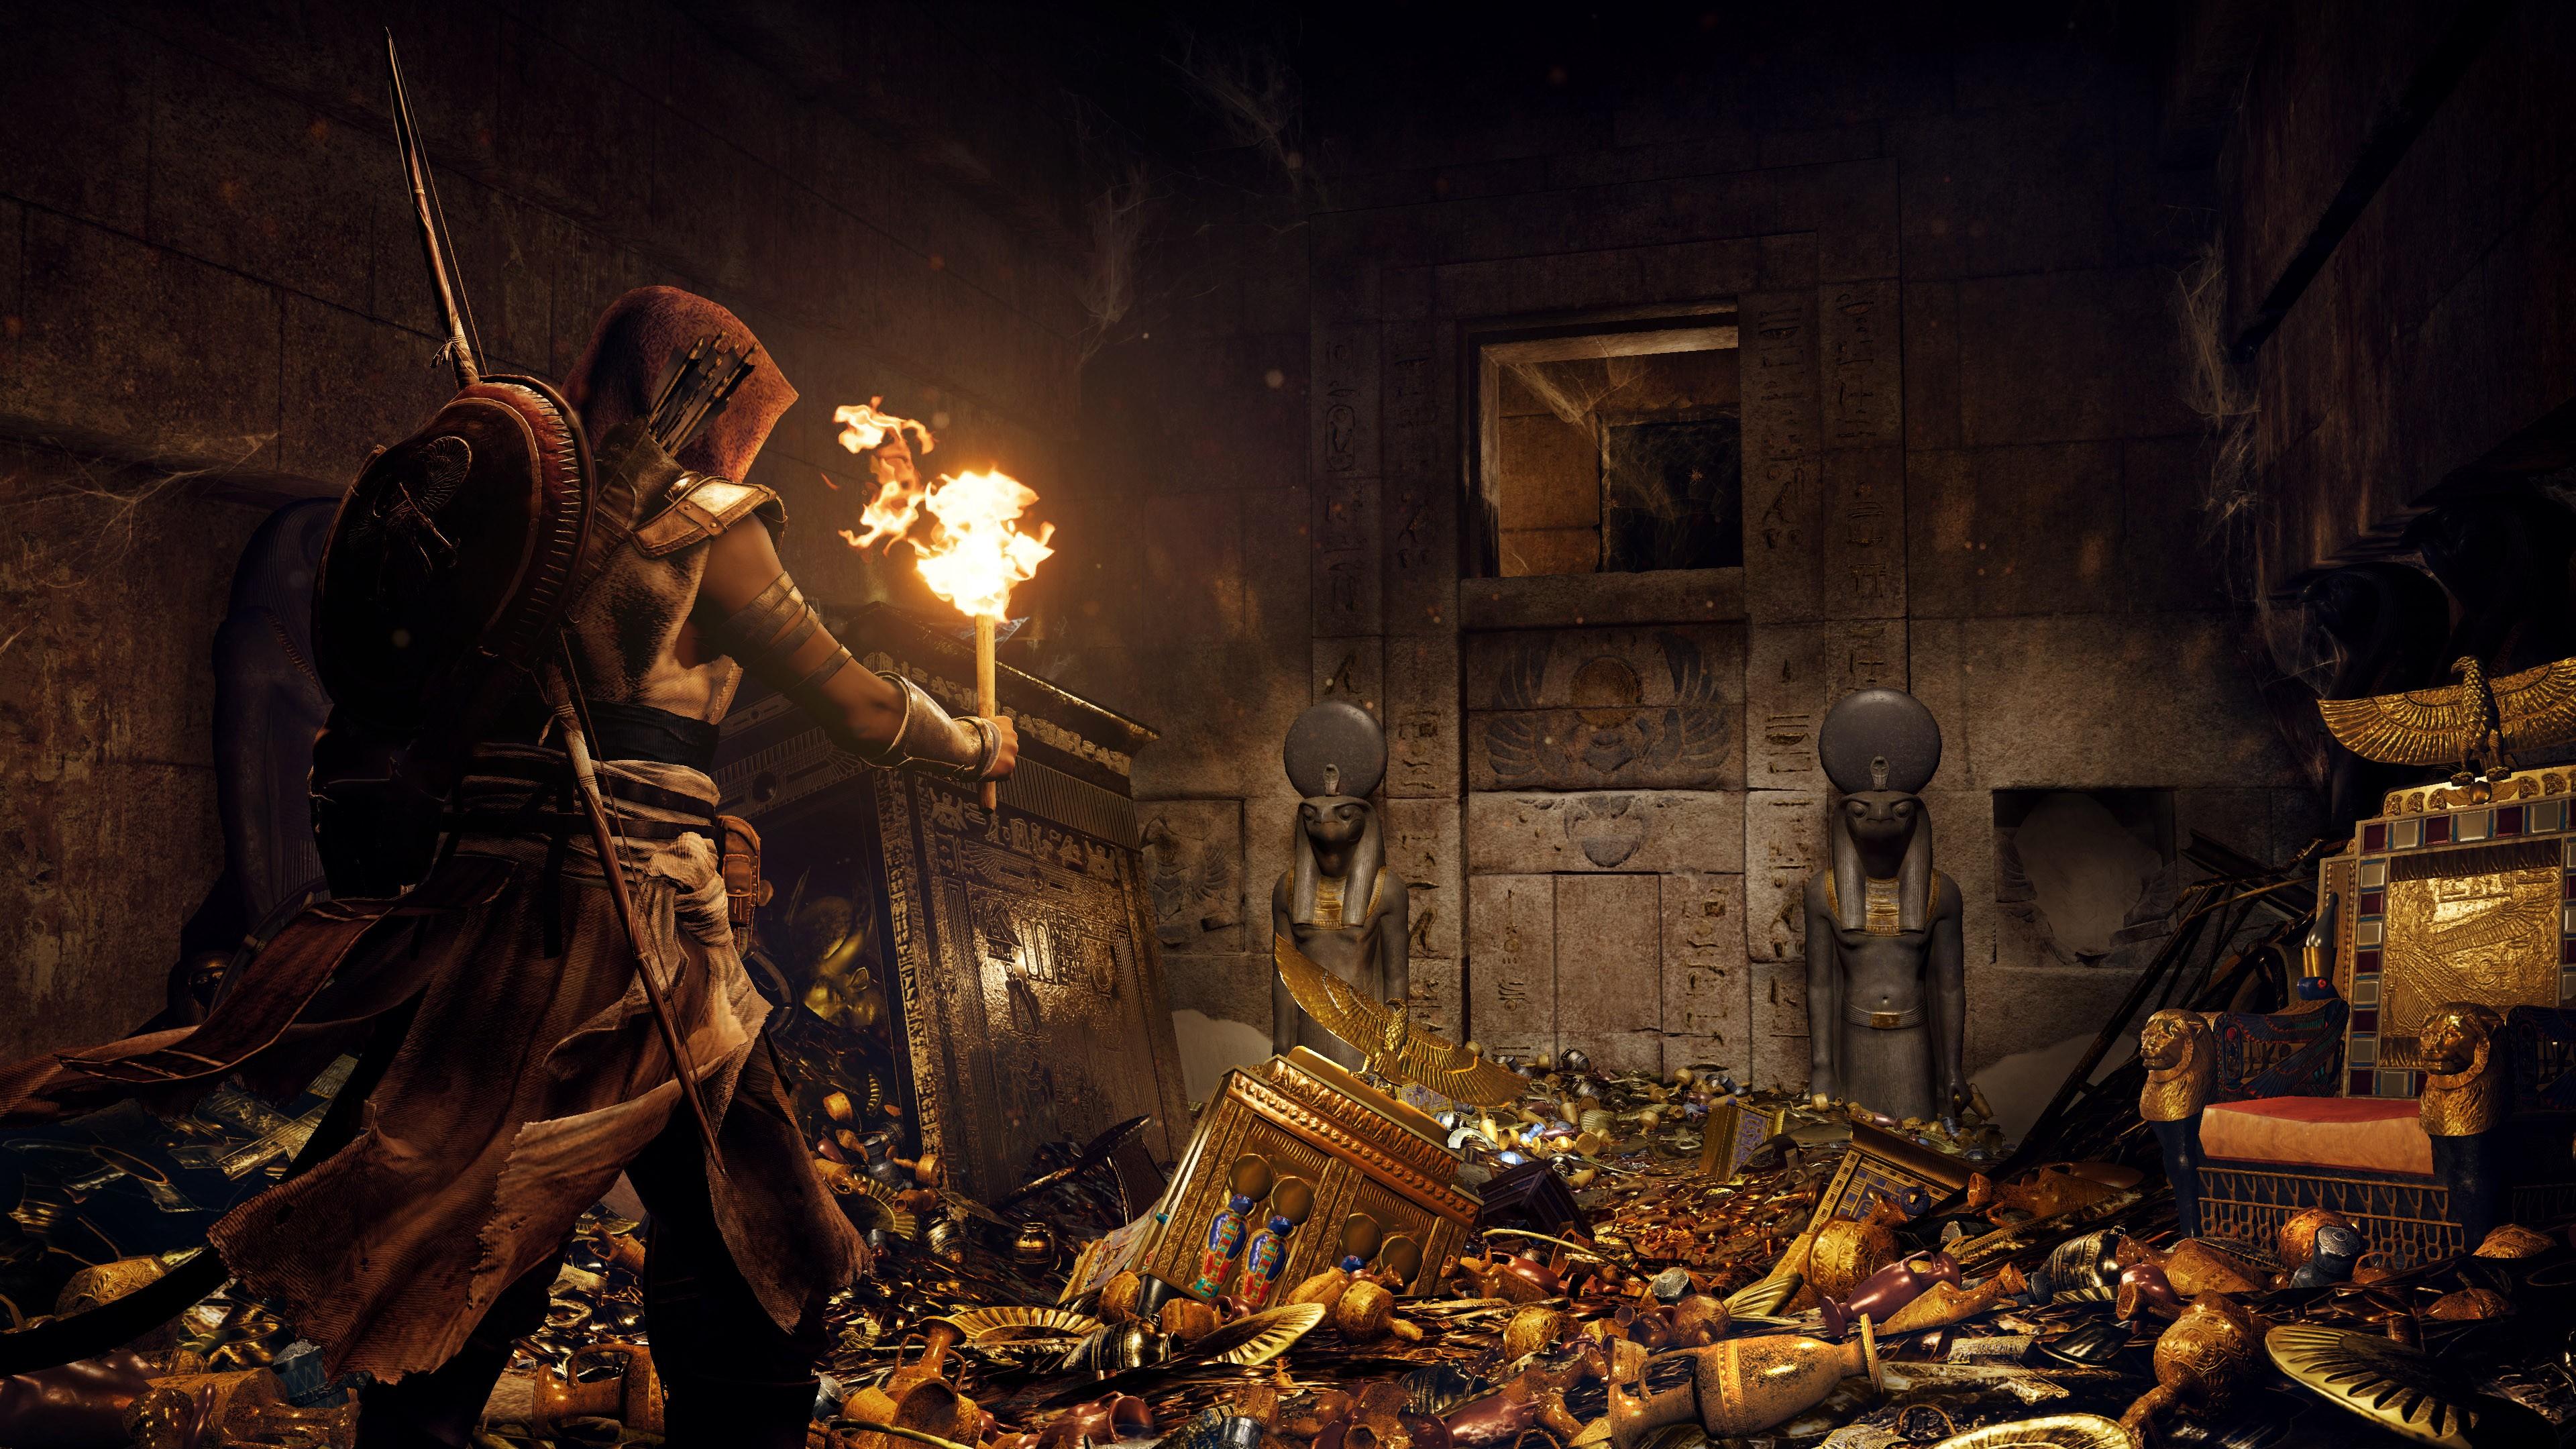 Fall Pumpkin Hd Wallpaper Wallpaper Assassin S Creed Origins 4k E3 2017